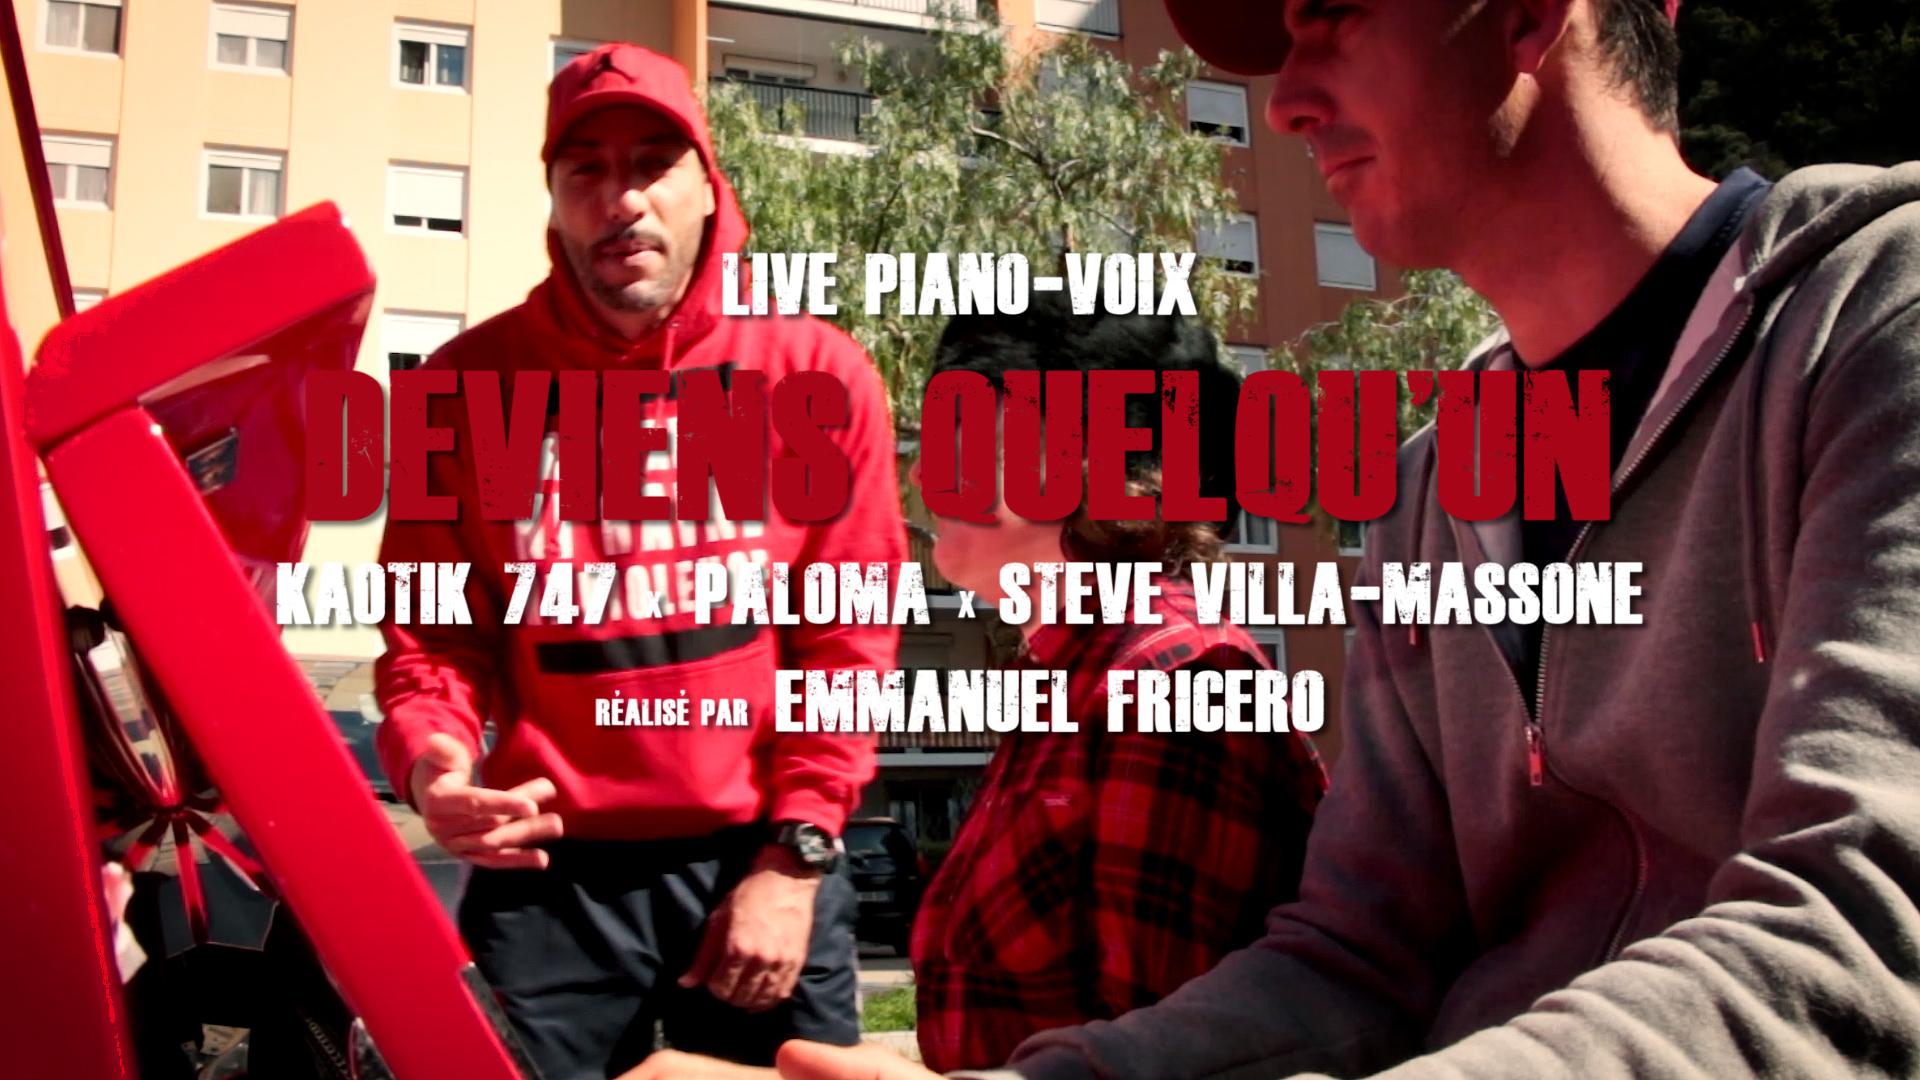 Live Piano-Voix / Kaotik 747 x Paloma x Steve Villa-Massone